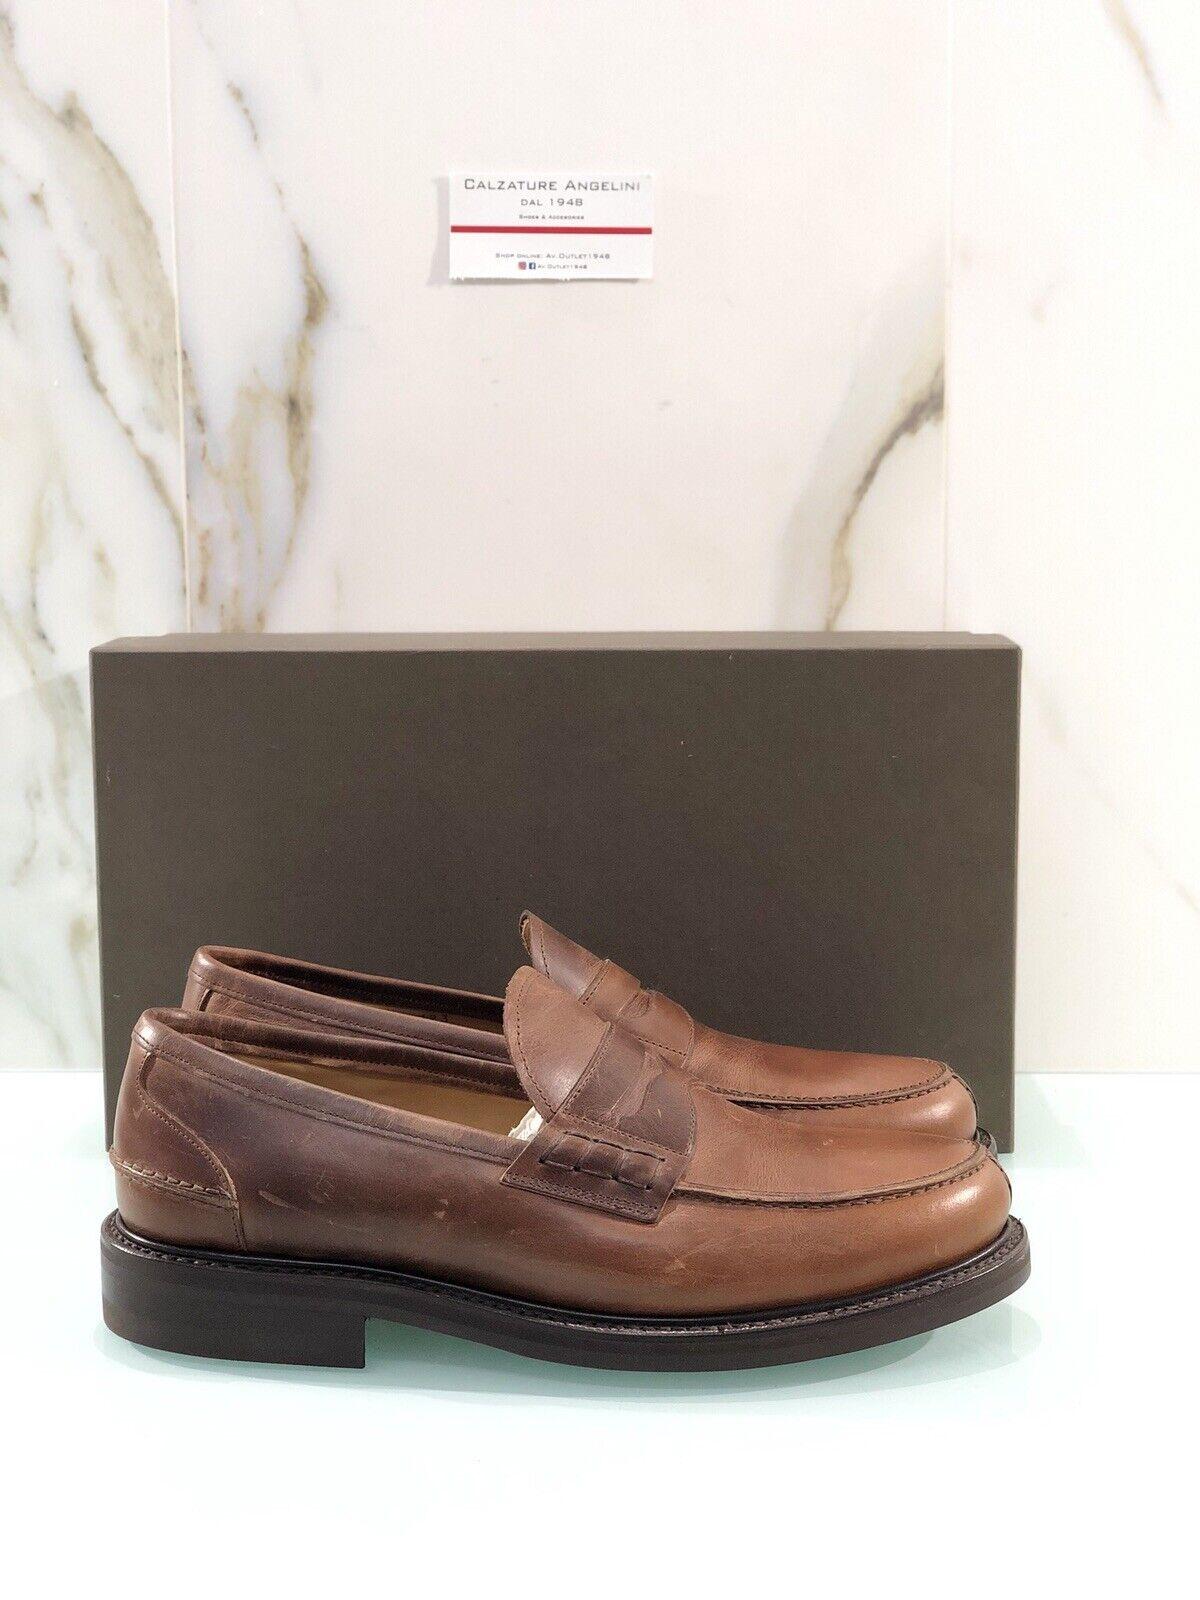 Moccasin Leather Leather Brugnoli Man Dainite British Sun 43 Luxury zapatos